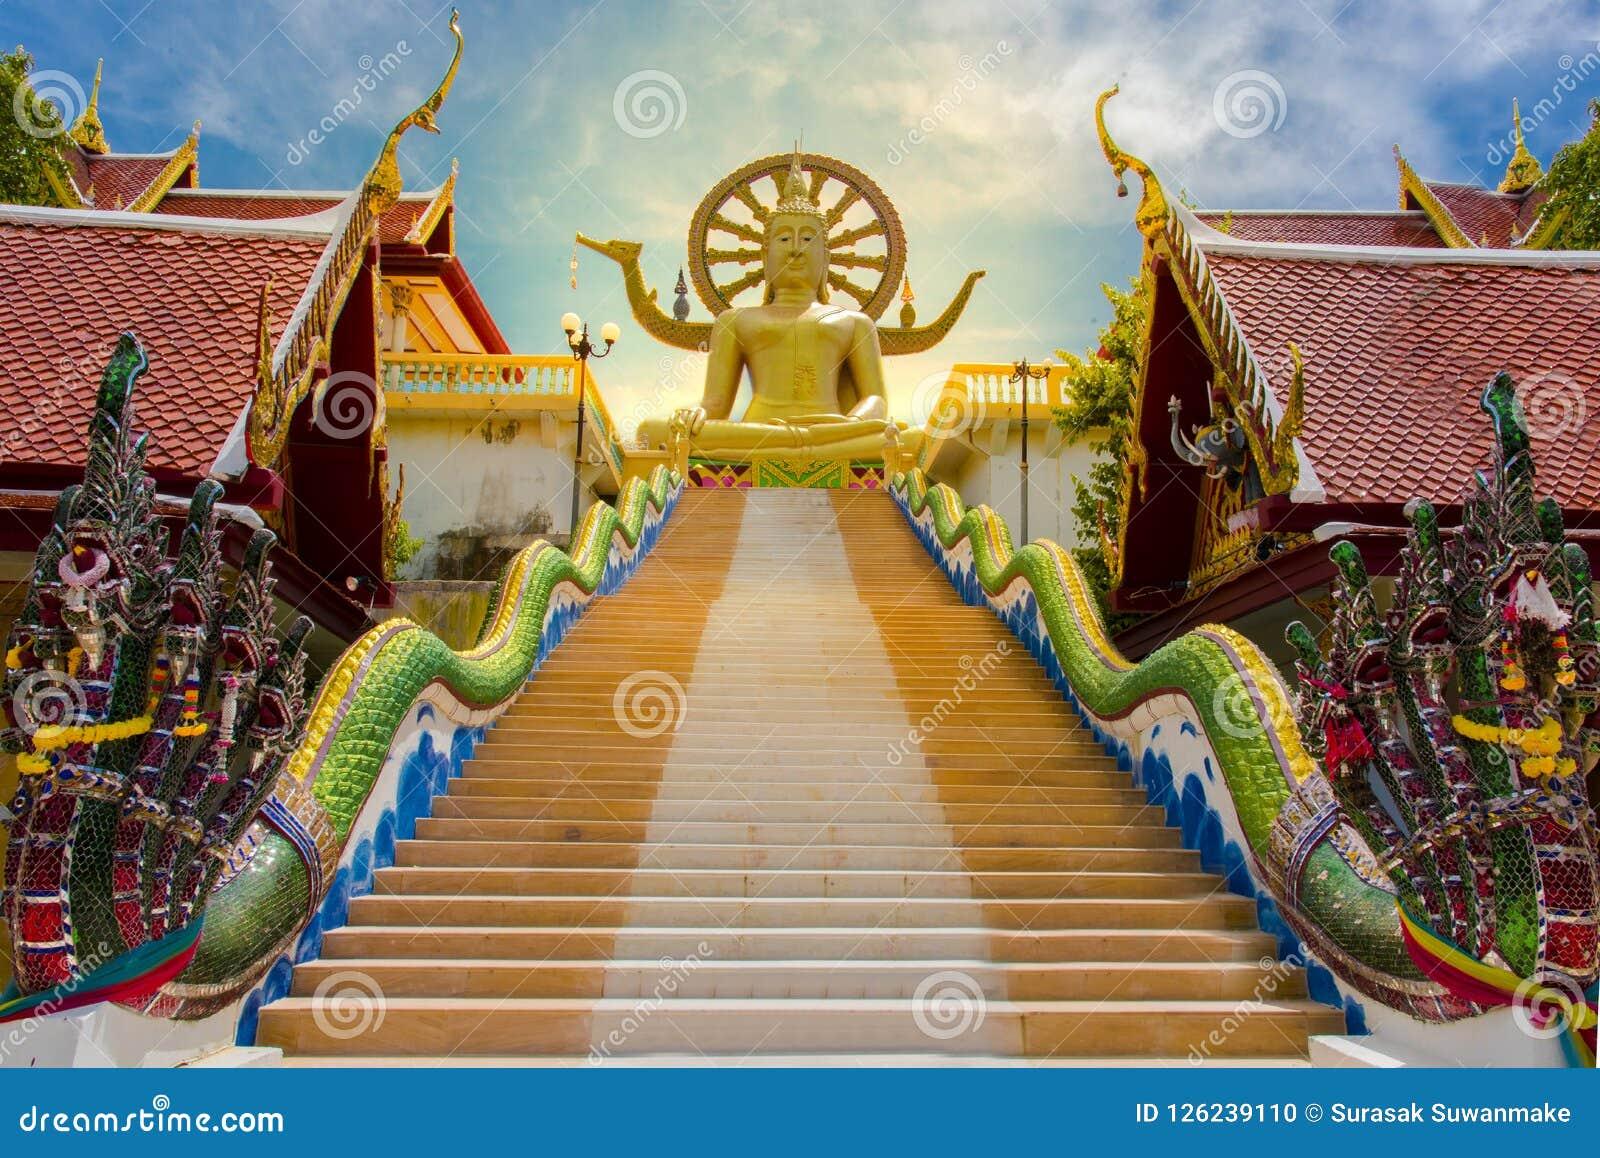 Big Buddha Temple at Koh Samui, Thailand. Beautiful temples